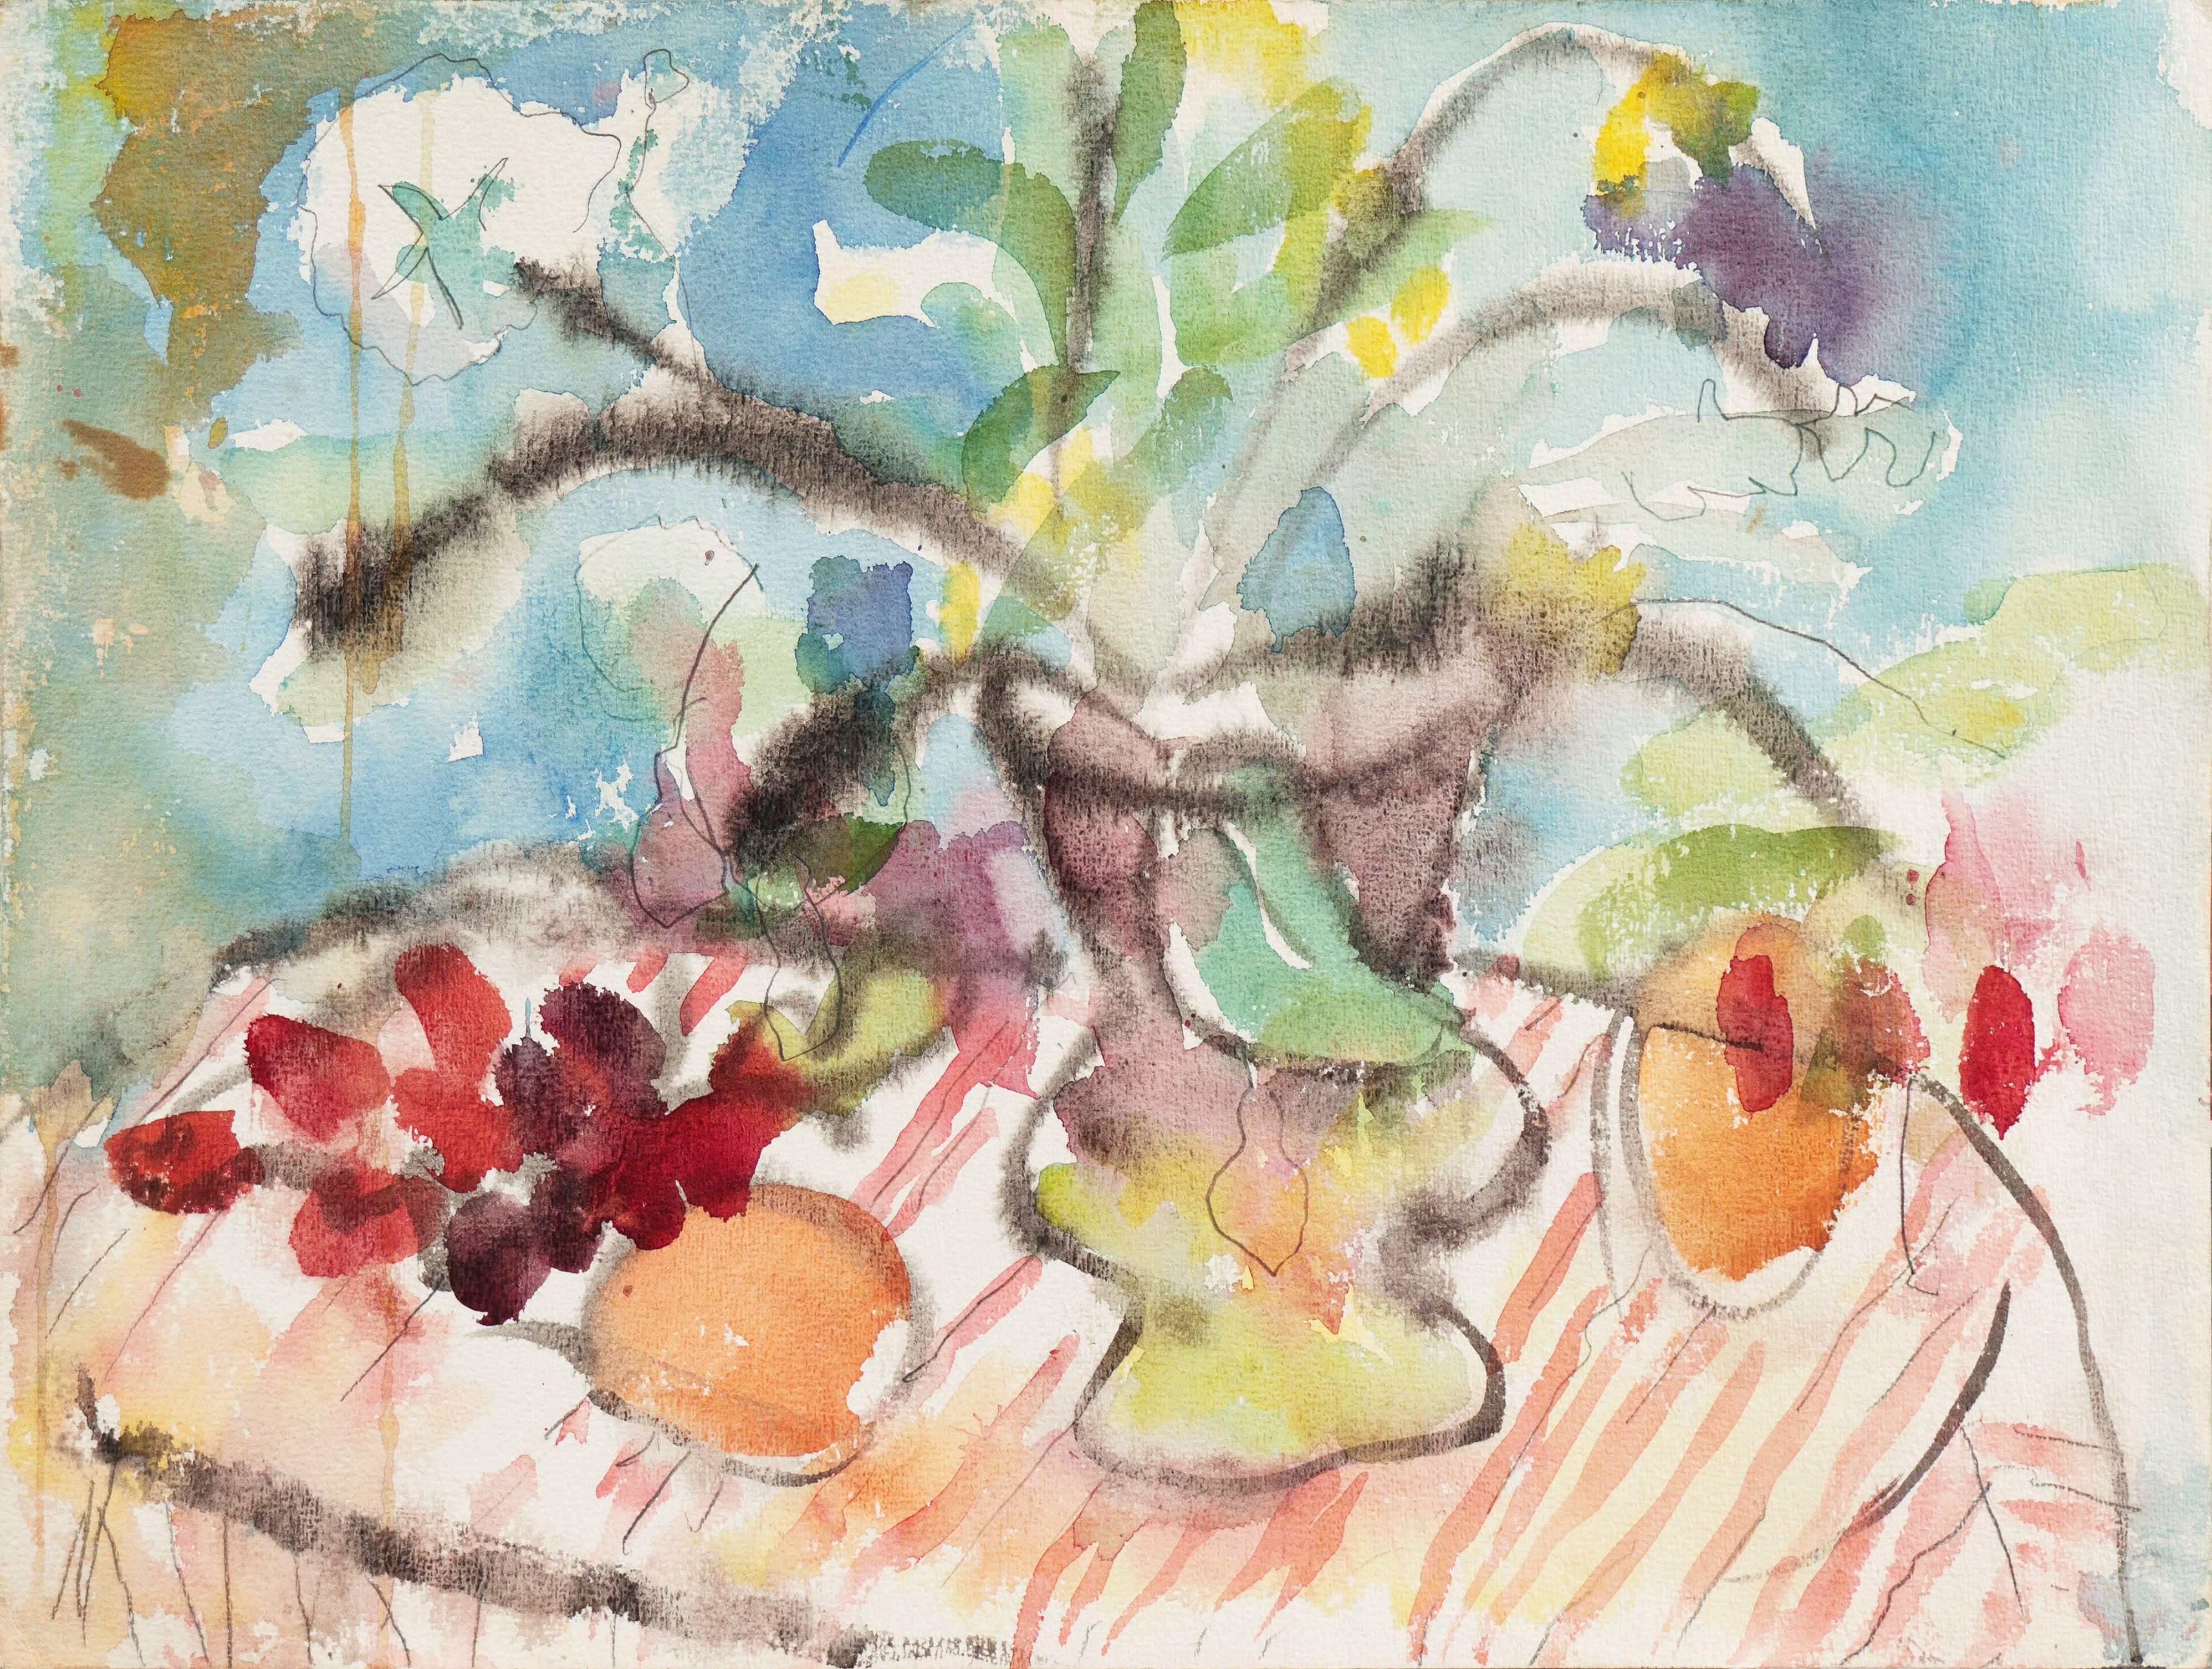 'Still Life', Louvre, LACMA, Académie Chaumière, California Post-Impressionist